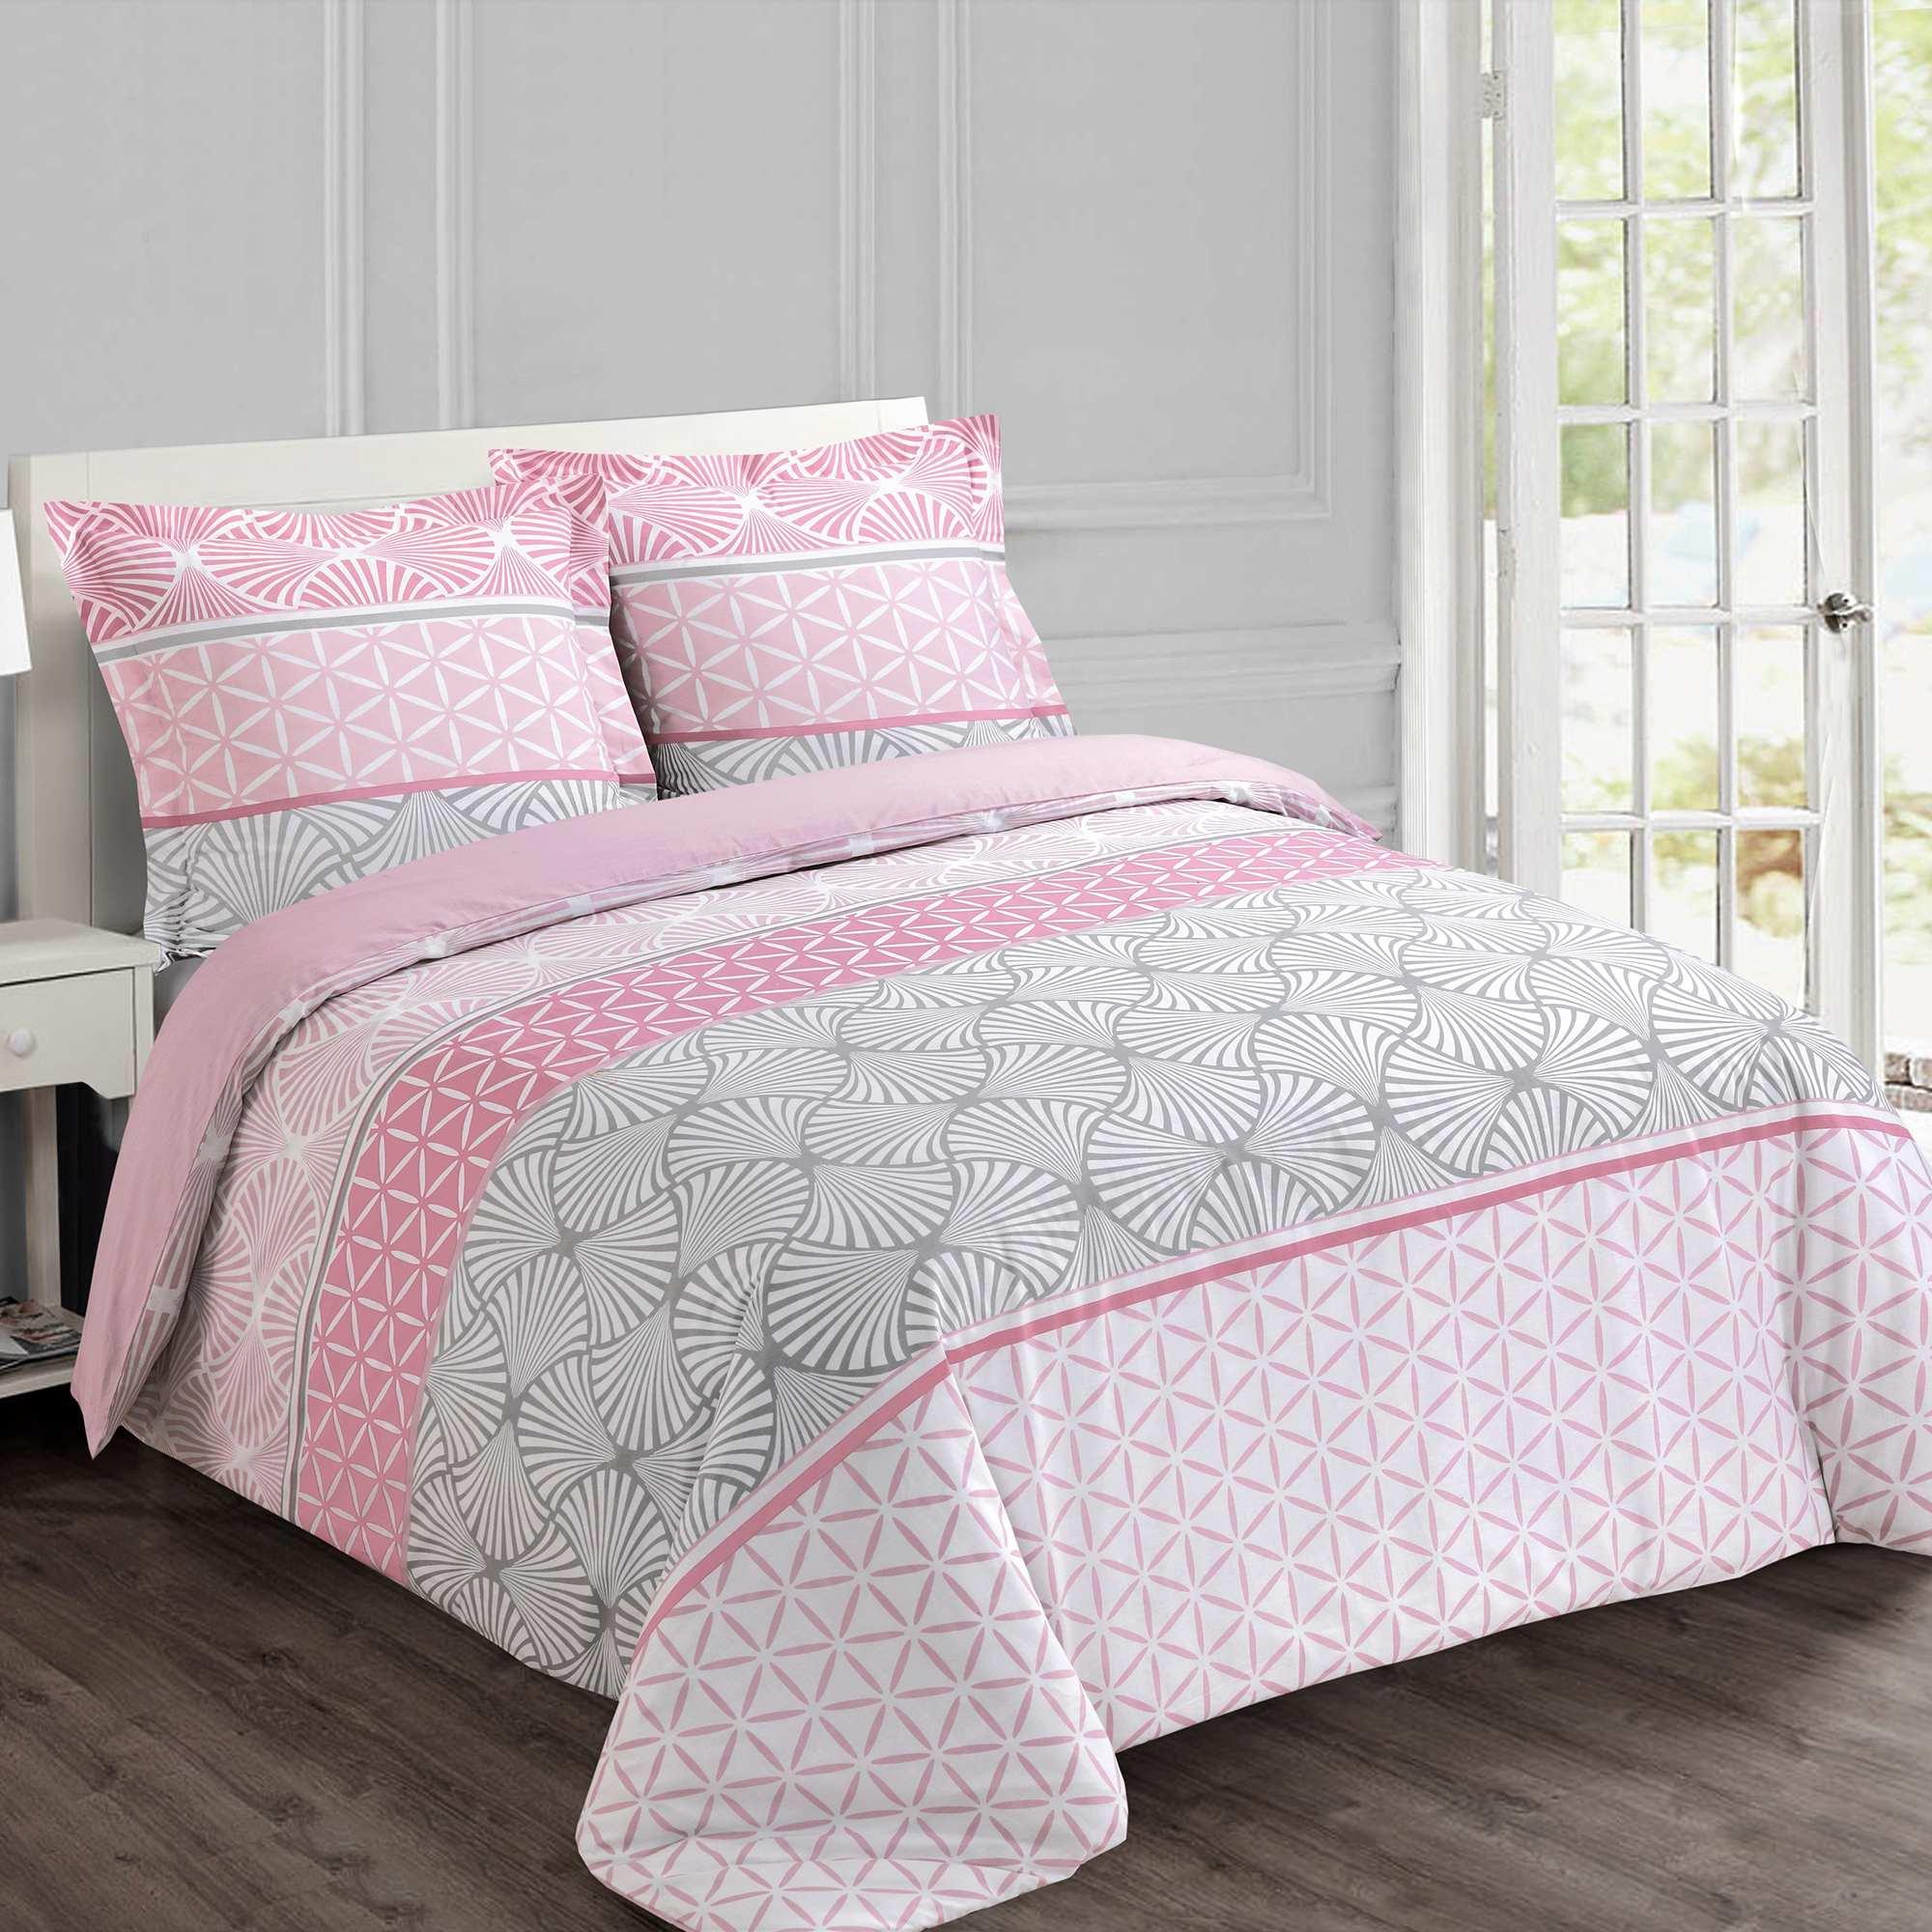 Juego de cama doble con motivos geom tricos hogar rosa kiabi 35 00 - Kiabi hogar ...